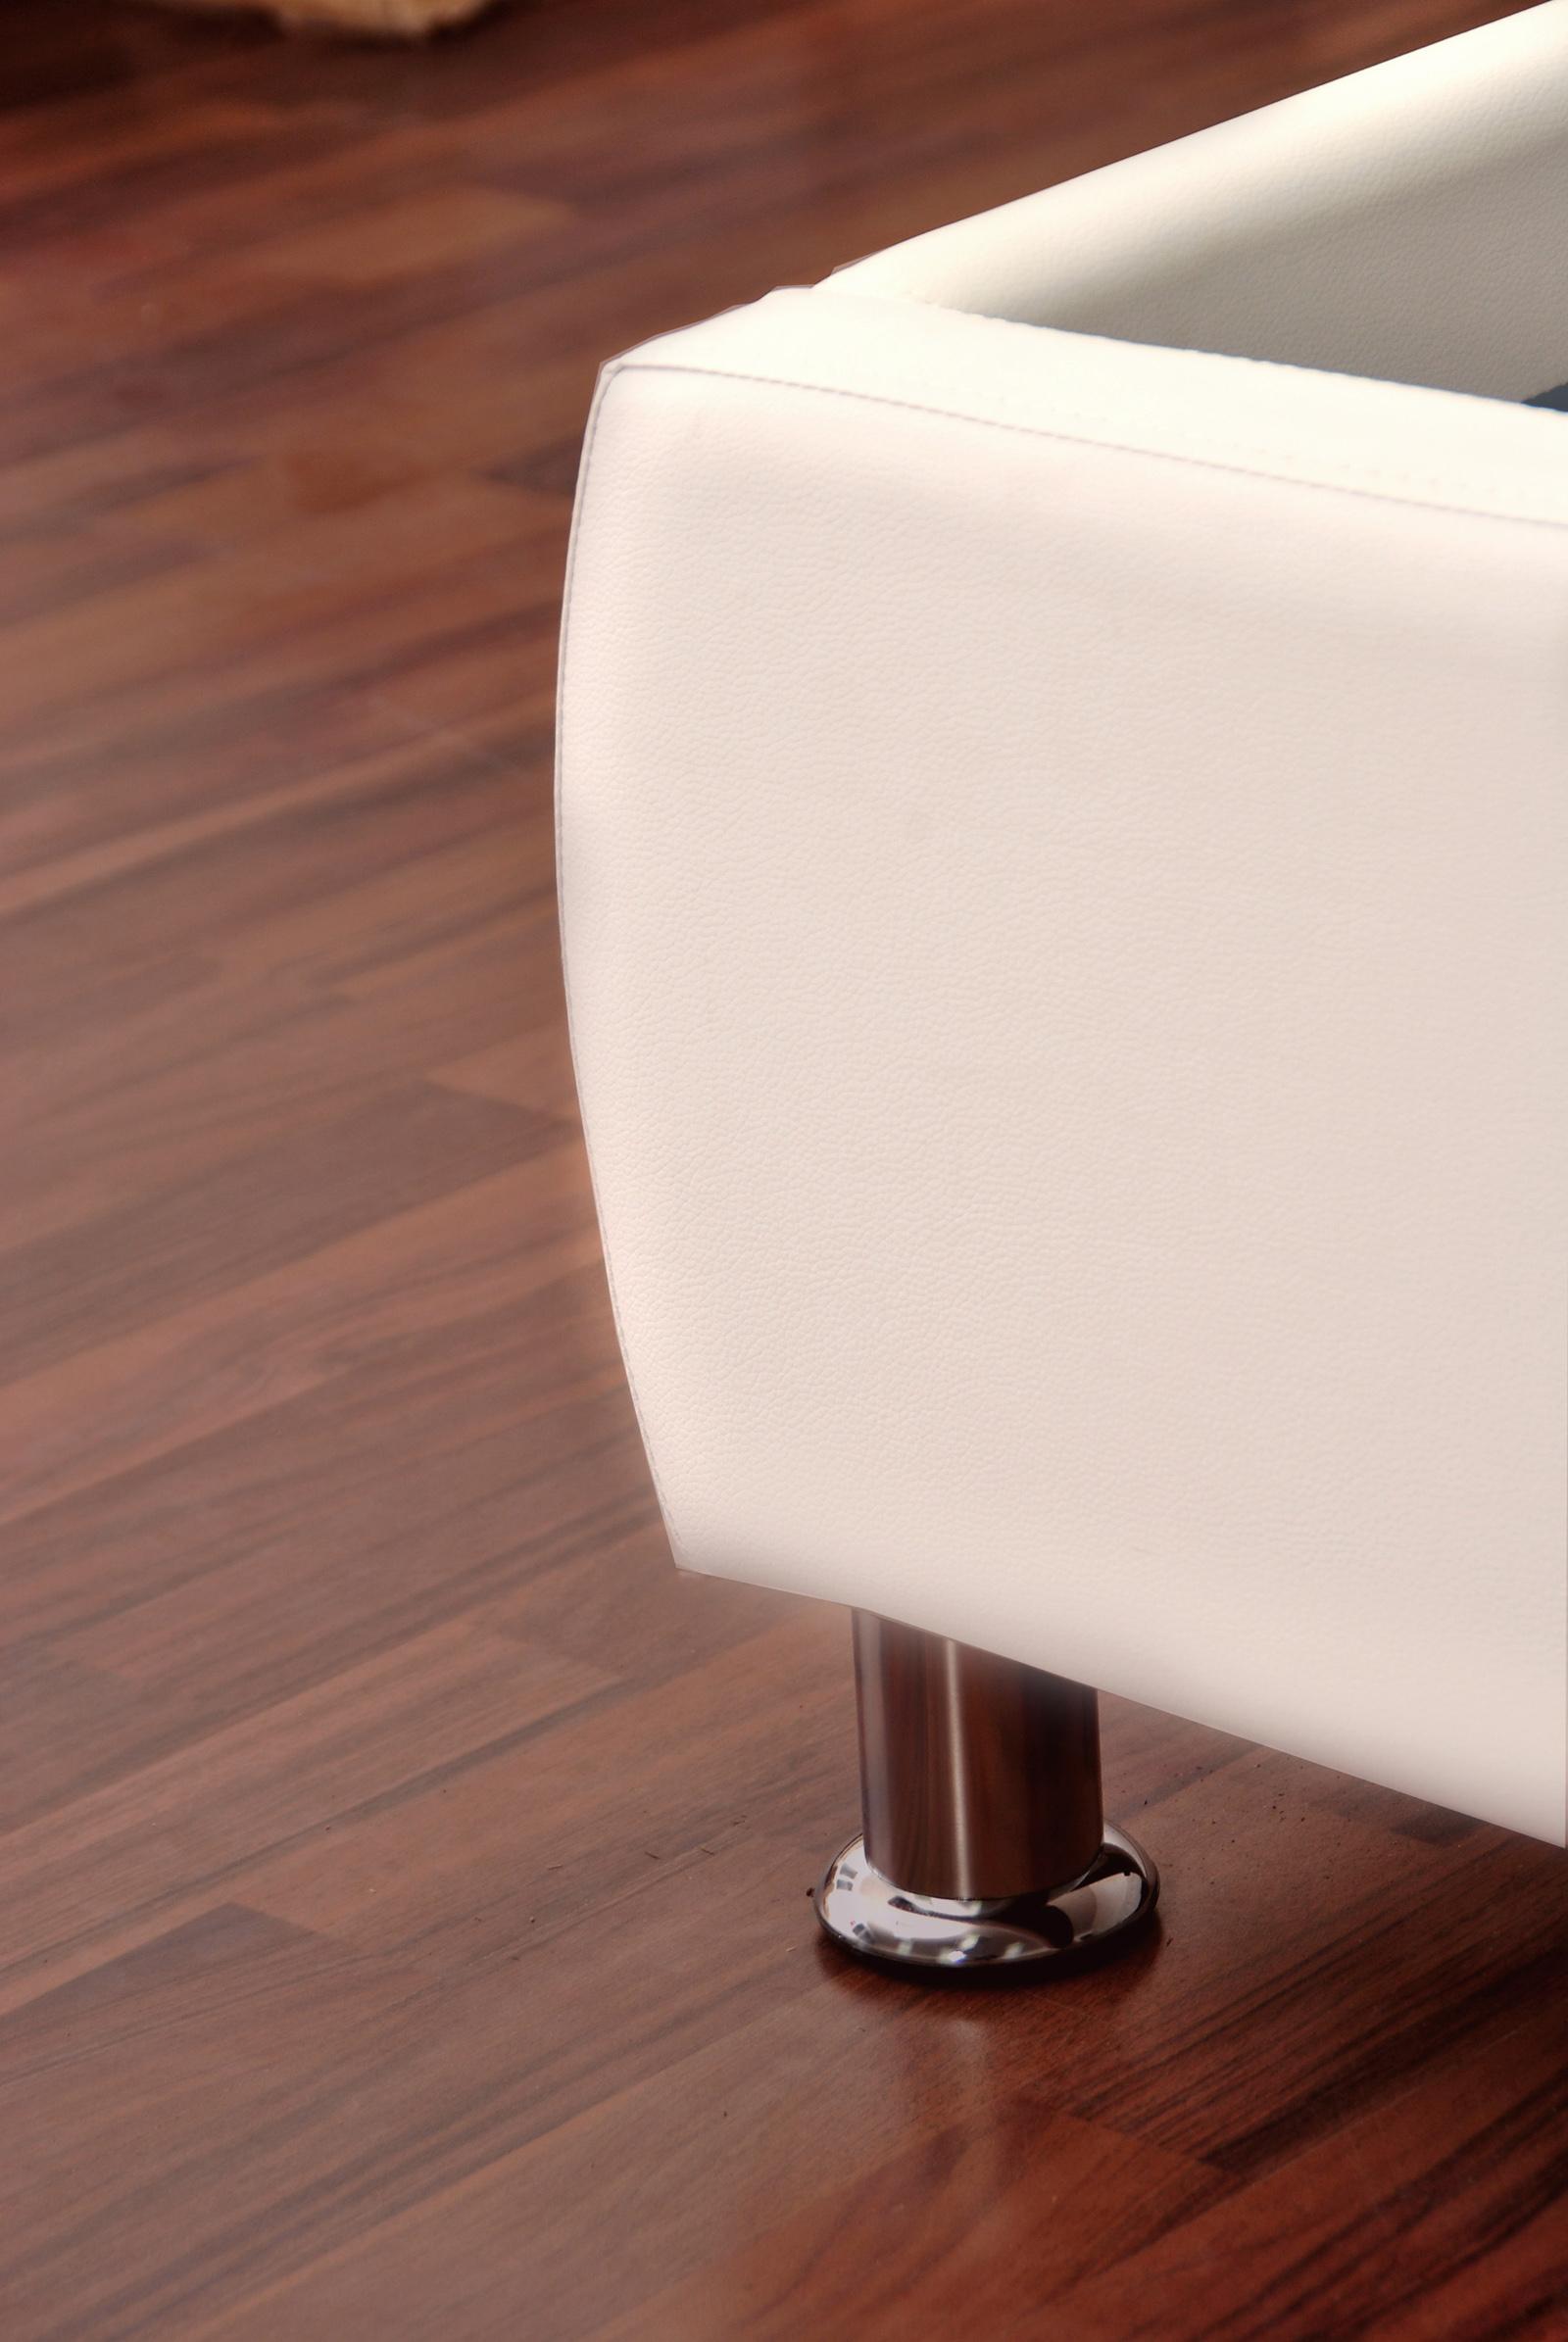 sam polsterbett 180x200 cm wei bettgestell g nstig zarah demn chst. Black Bedroom Furniture Sets. Home Design Ideas